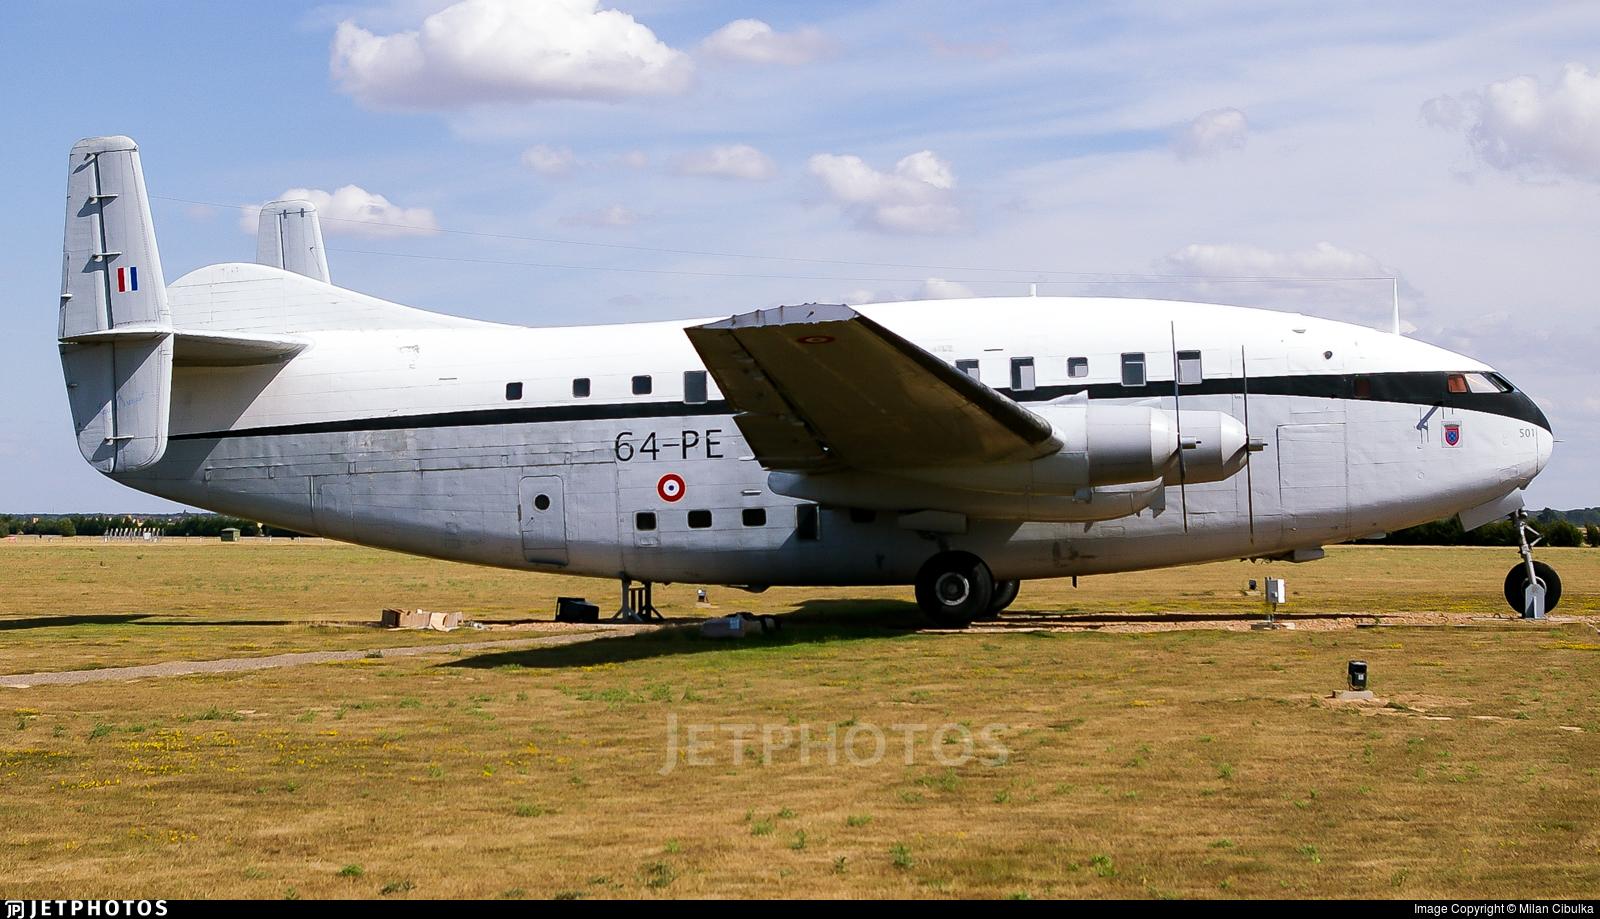 501 - Breguet 765 Sahara - France - Air Force